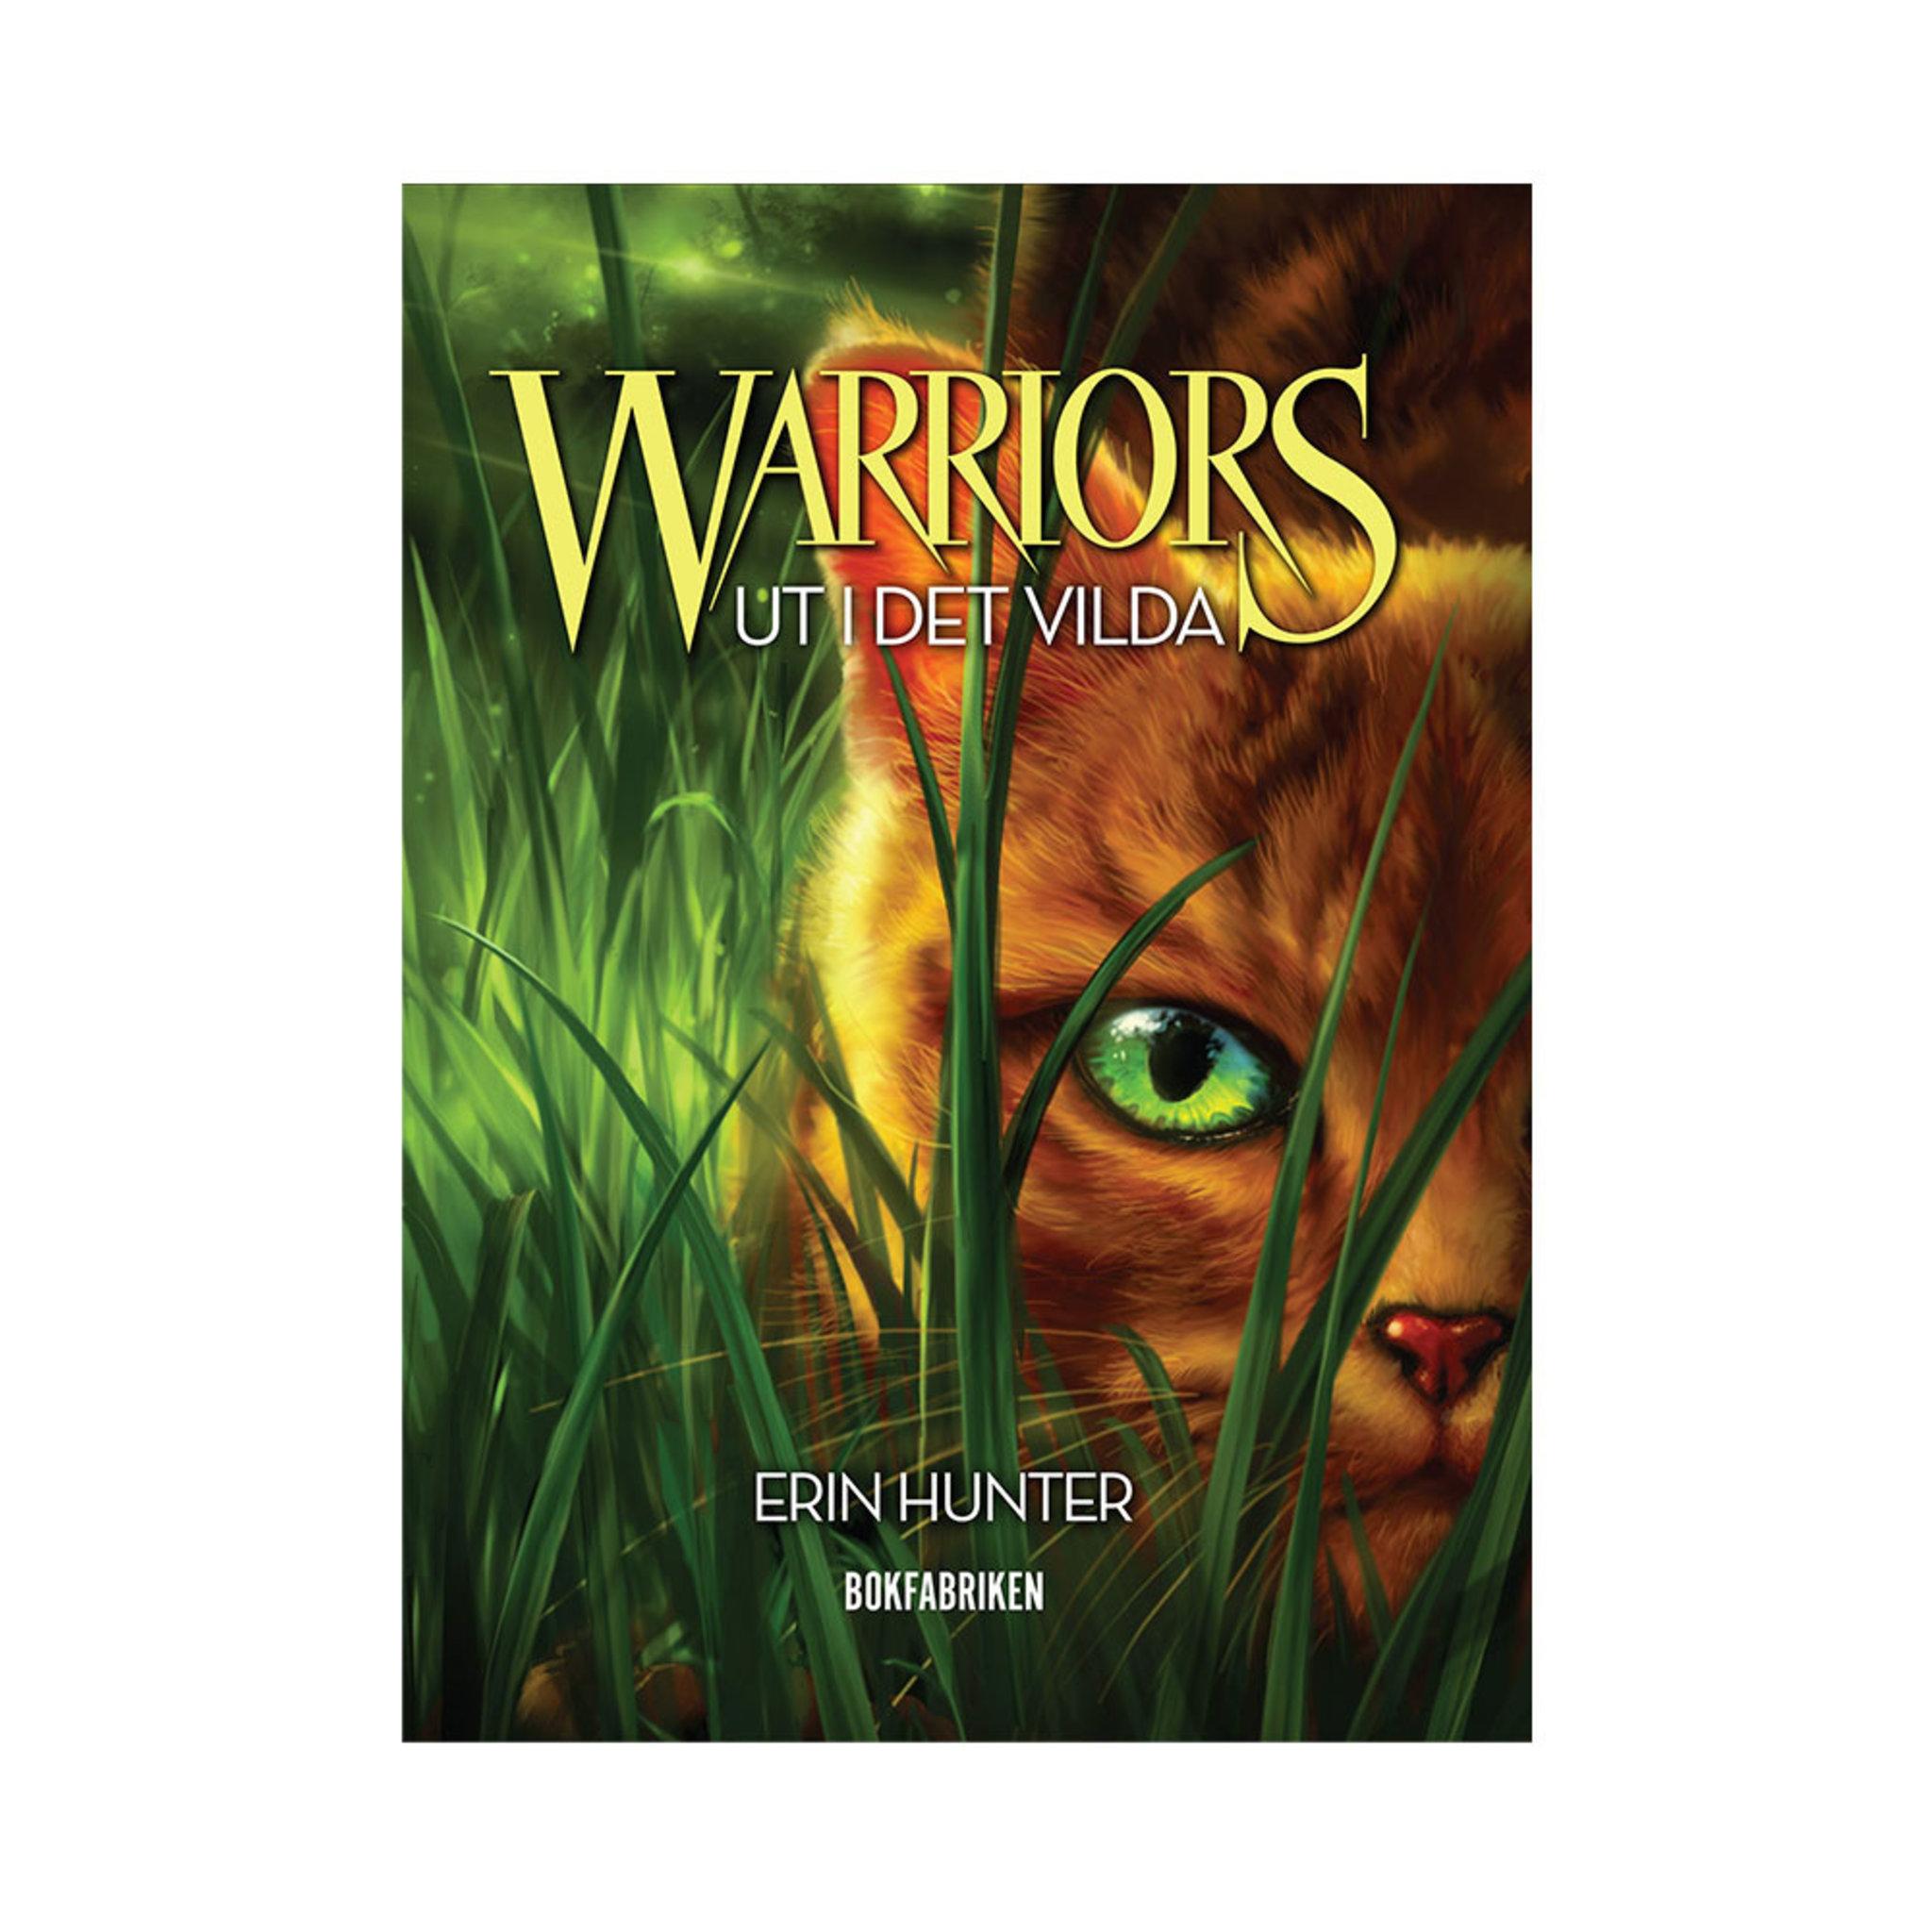 Warriors 1. Ut i det vilda/Erin Hunter